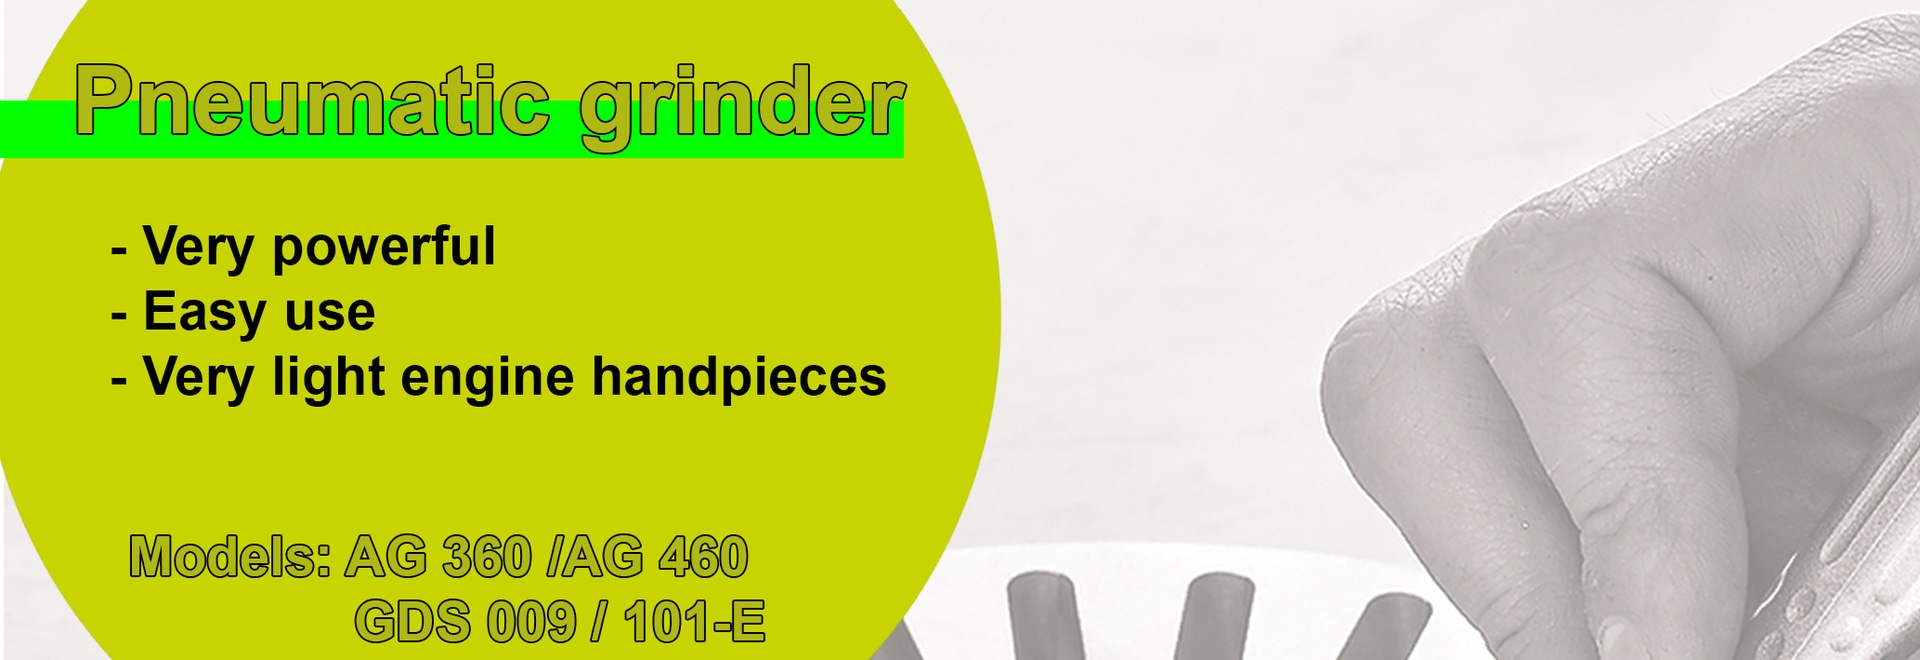 Assfalg - Pneumatic Grinders